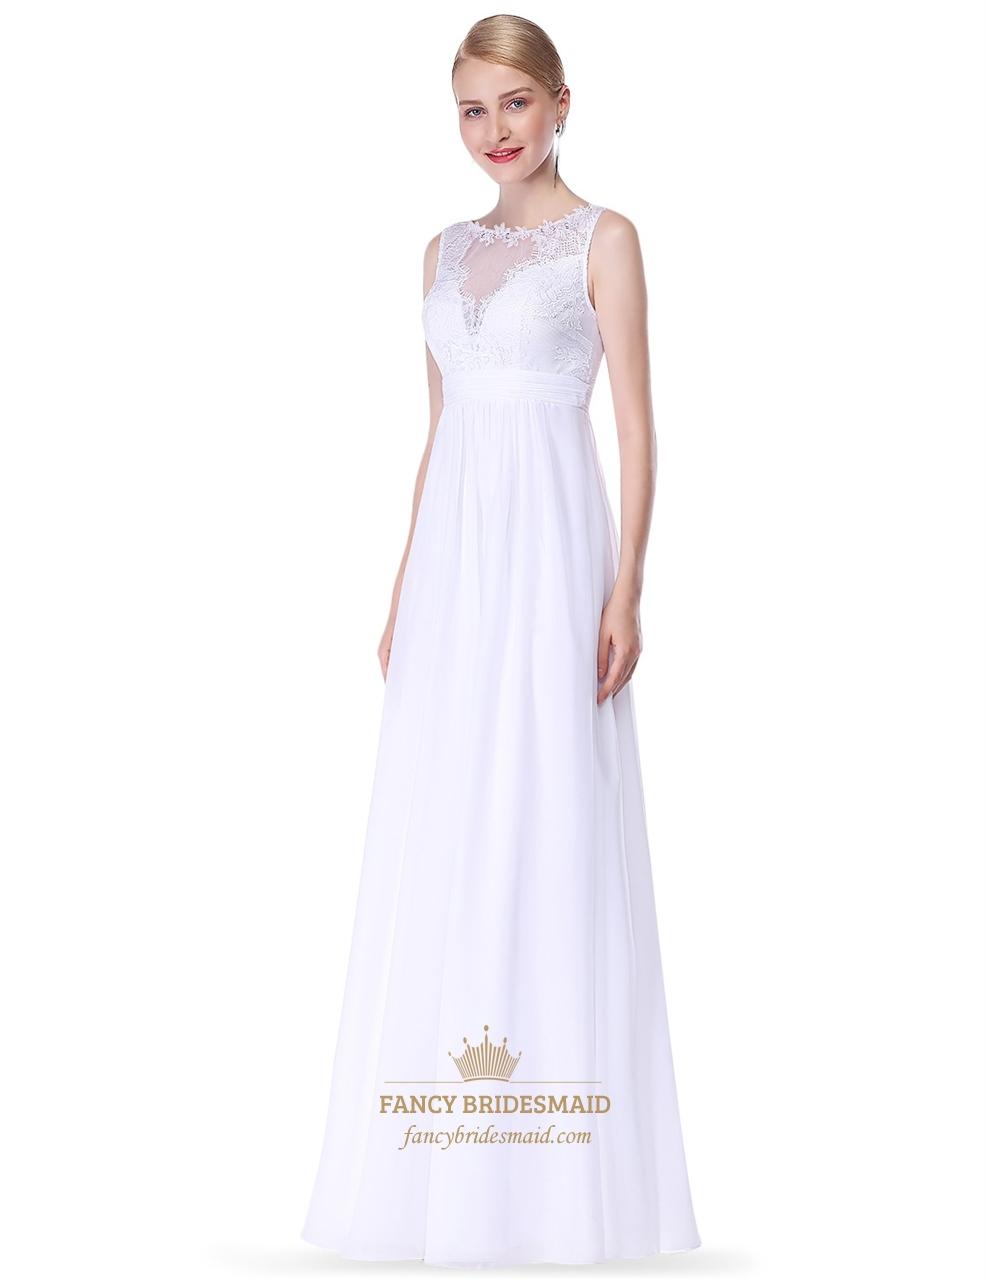 59ef247dfd549 Illusion Lace Bodice Chiffon Skirt Sleeveless Long Bridesmaid Dress.  Product Photos. Color